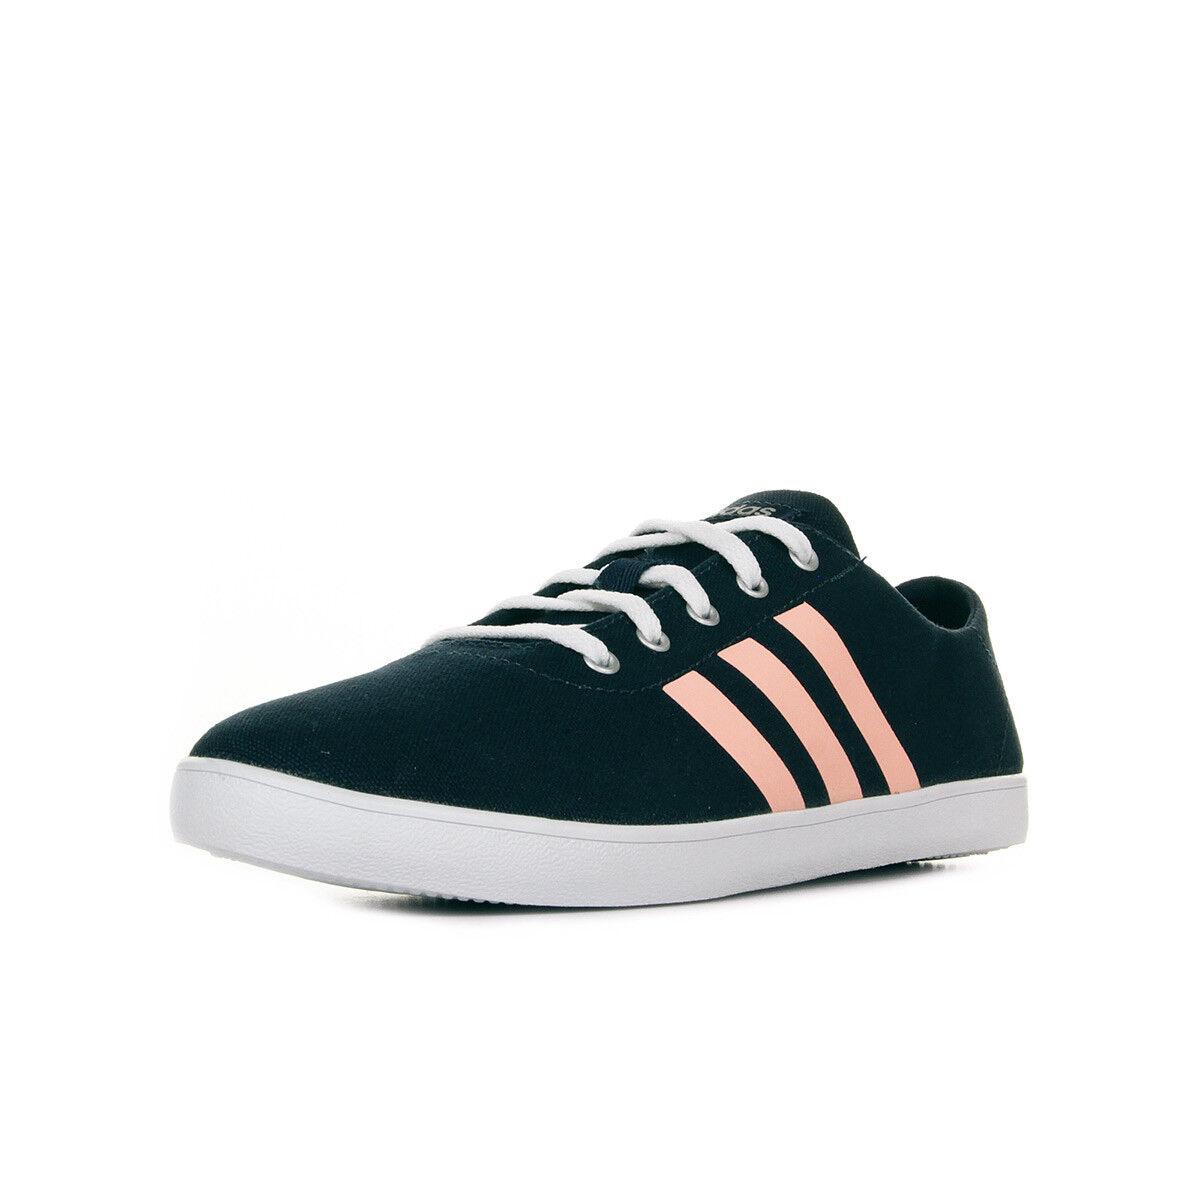 Chaussures Baskets adidas Neo femme Qt Vulc VS W taille Bleu marine Bleue